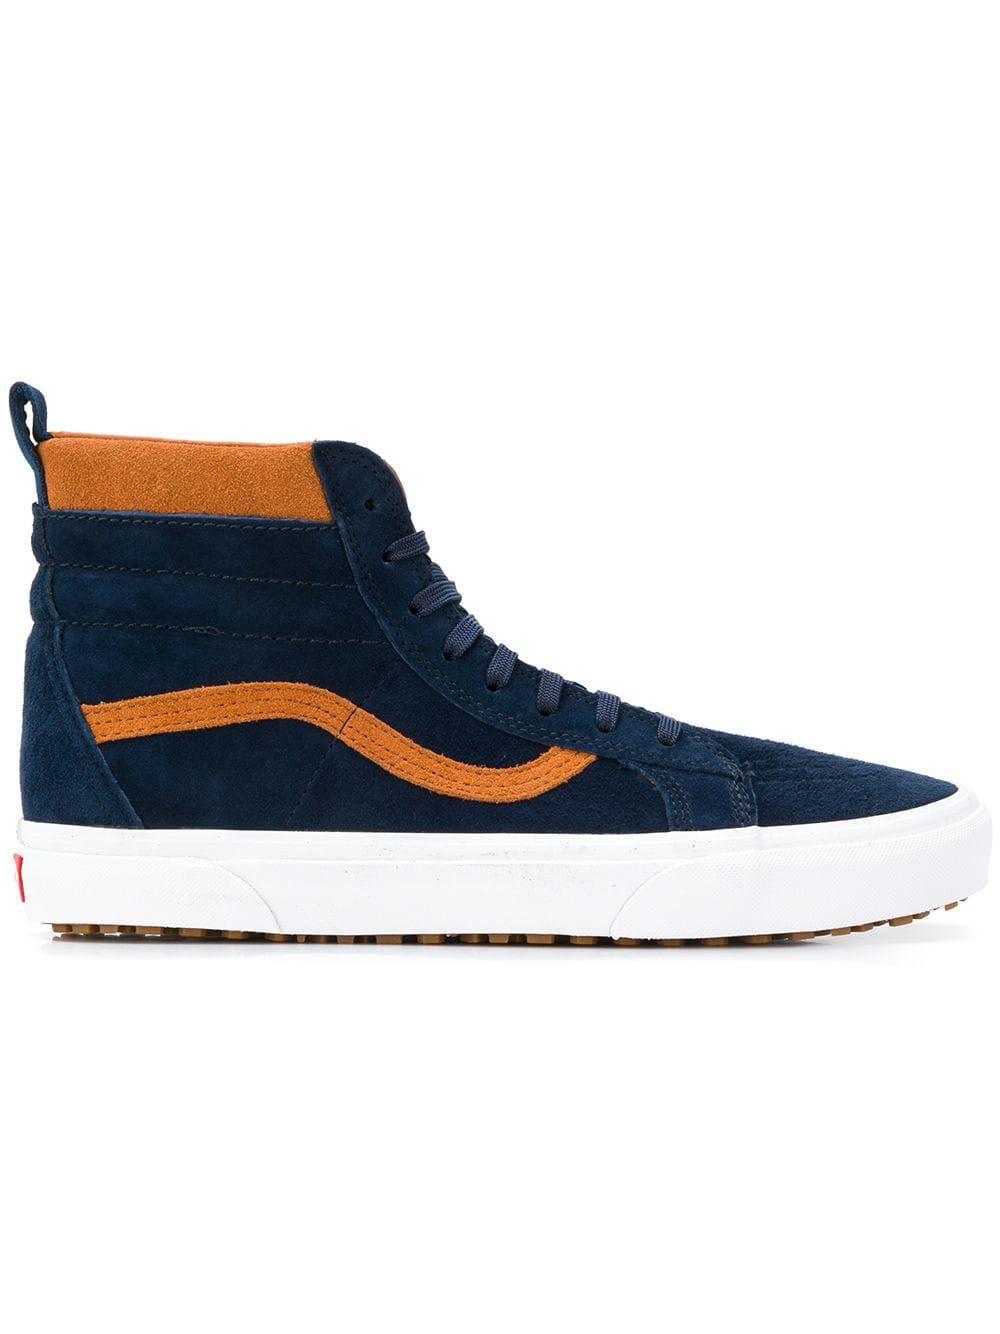 dfcd1969b009f0 Vans Sk8-hi Sneakers in Blue for Men - Lyst